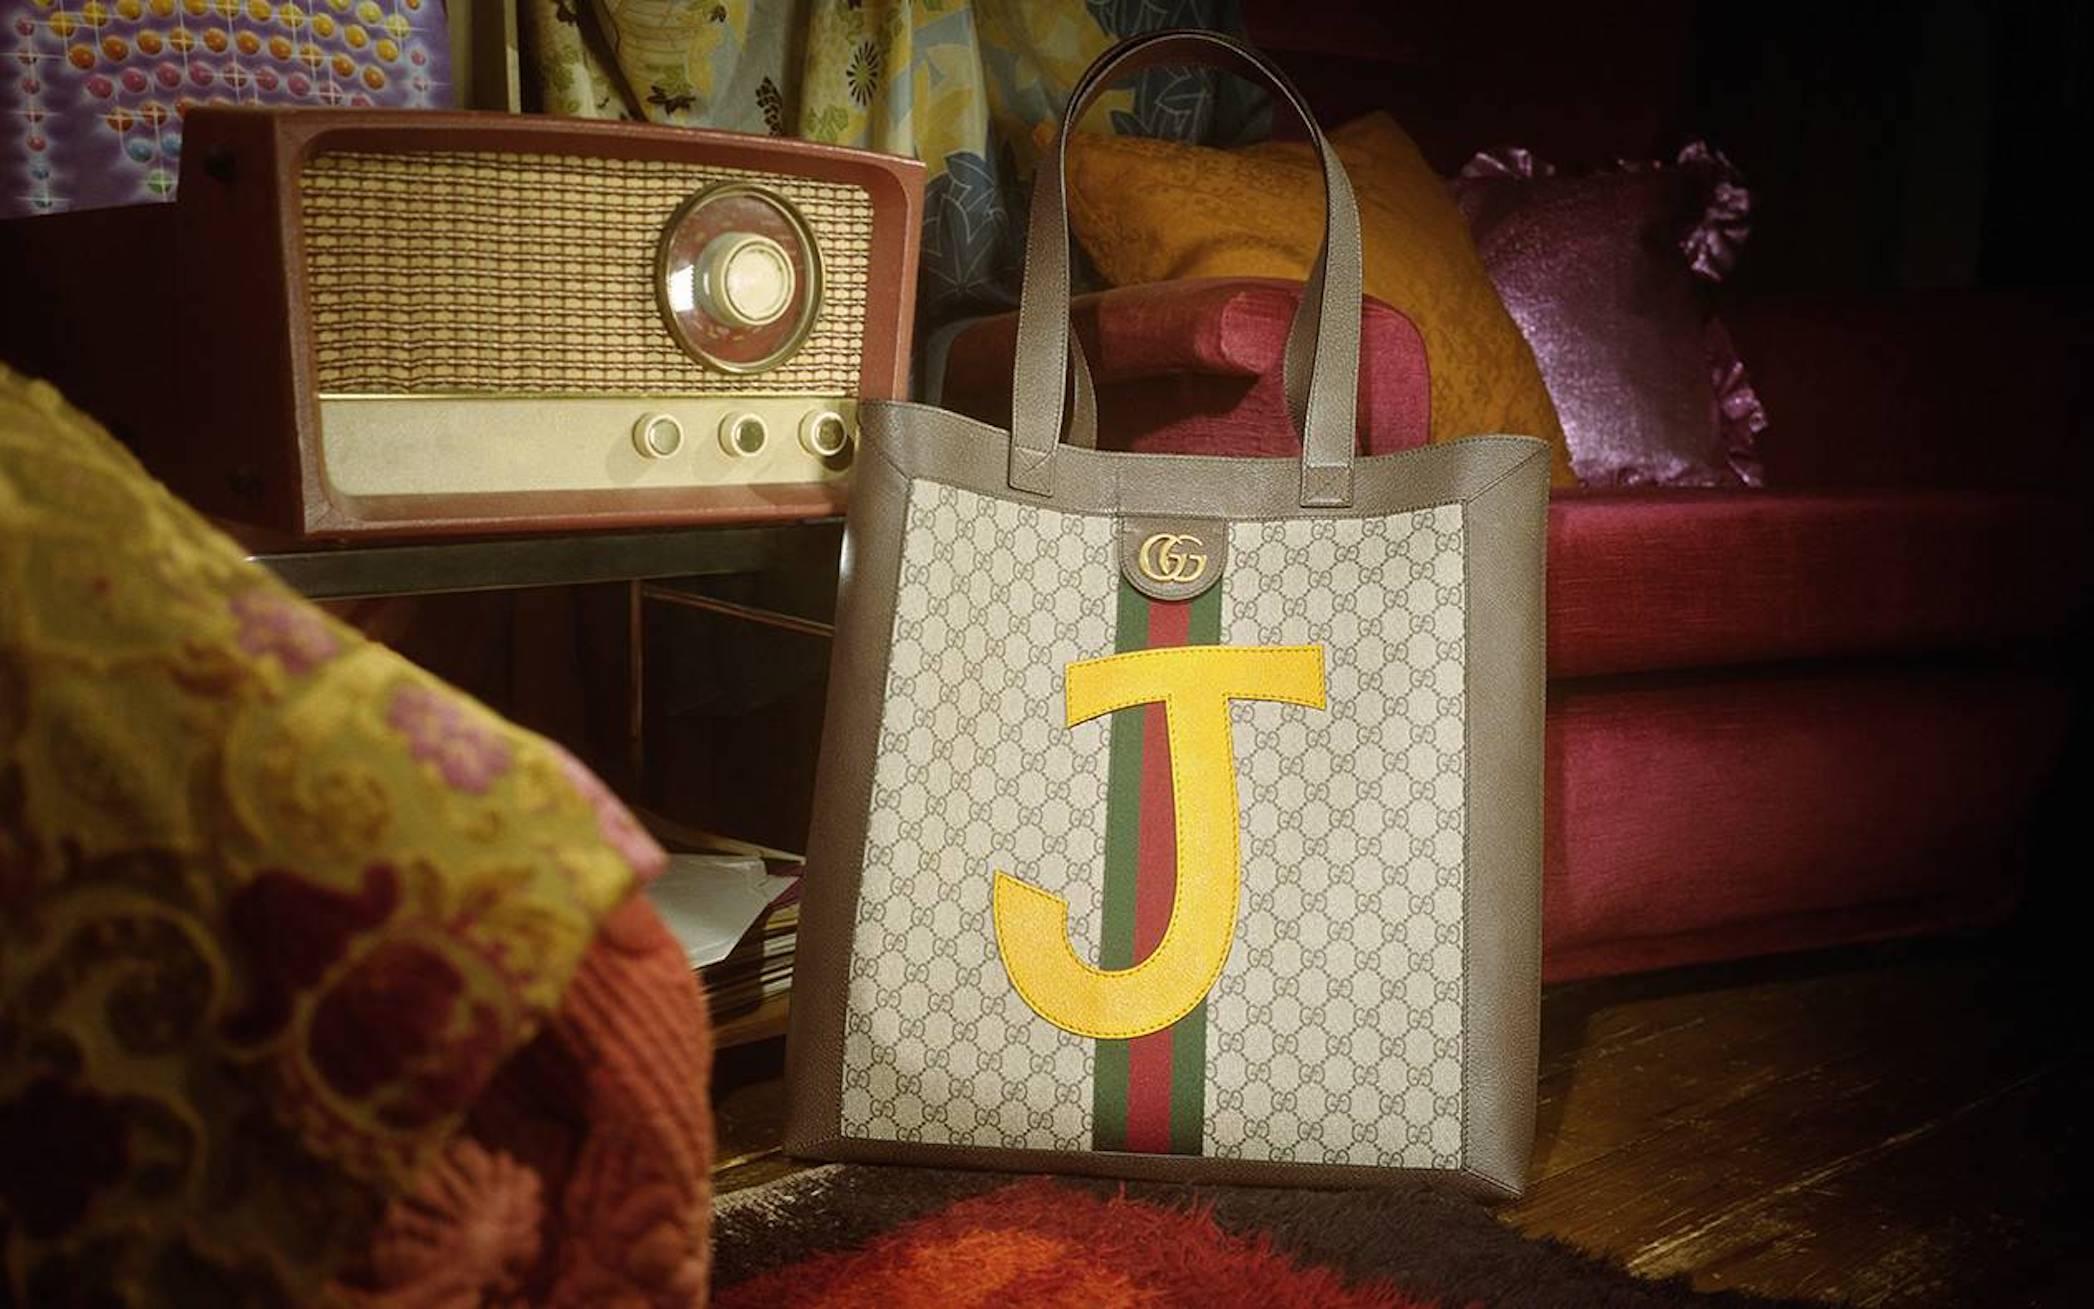 Customisable gucci bag